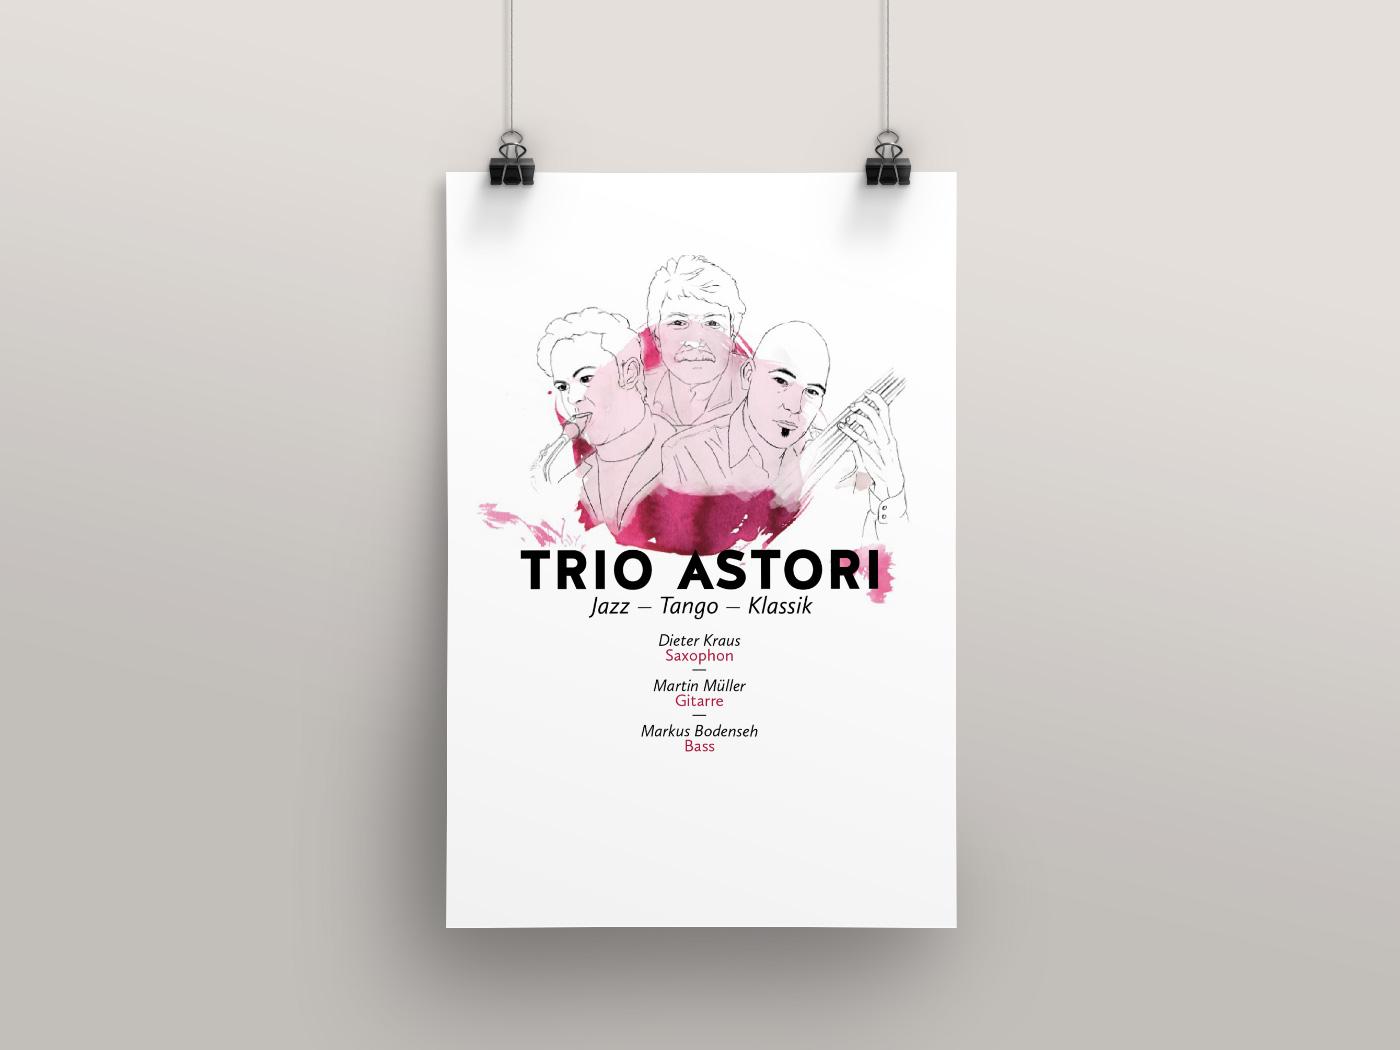 trio-astori_artwork_poster_grafik_design_marina_grimme_augsburg